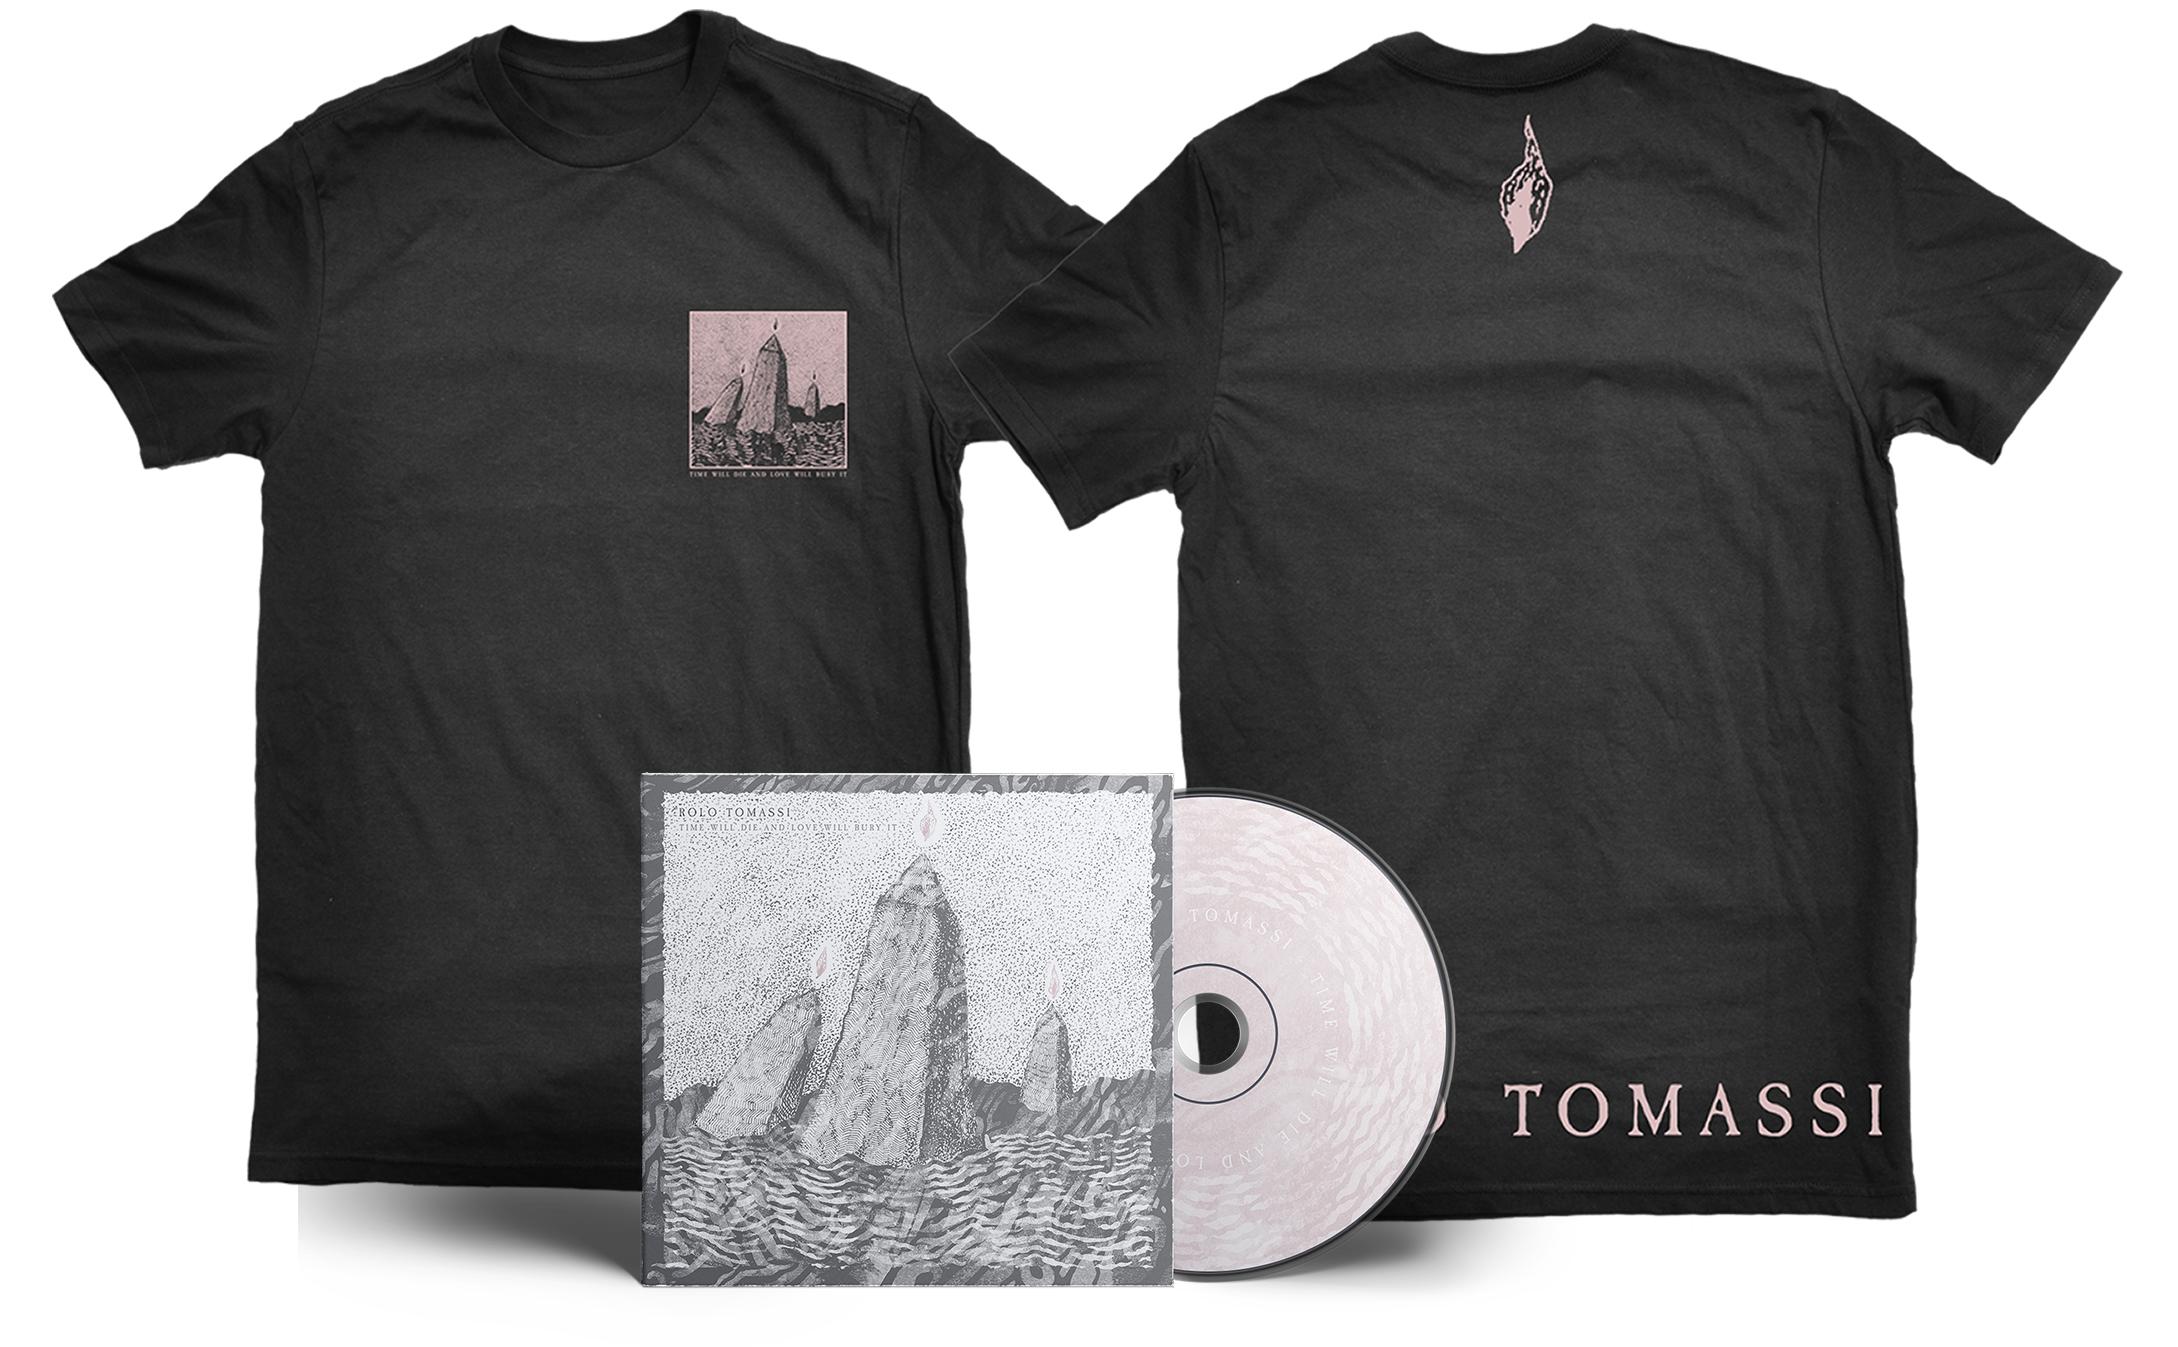 Rolo Tomassi - '...Love Will Bury It' CD + shirt